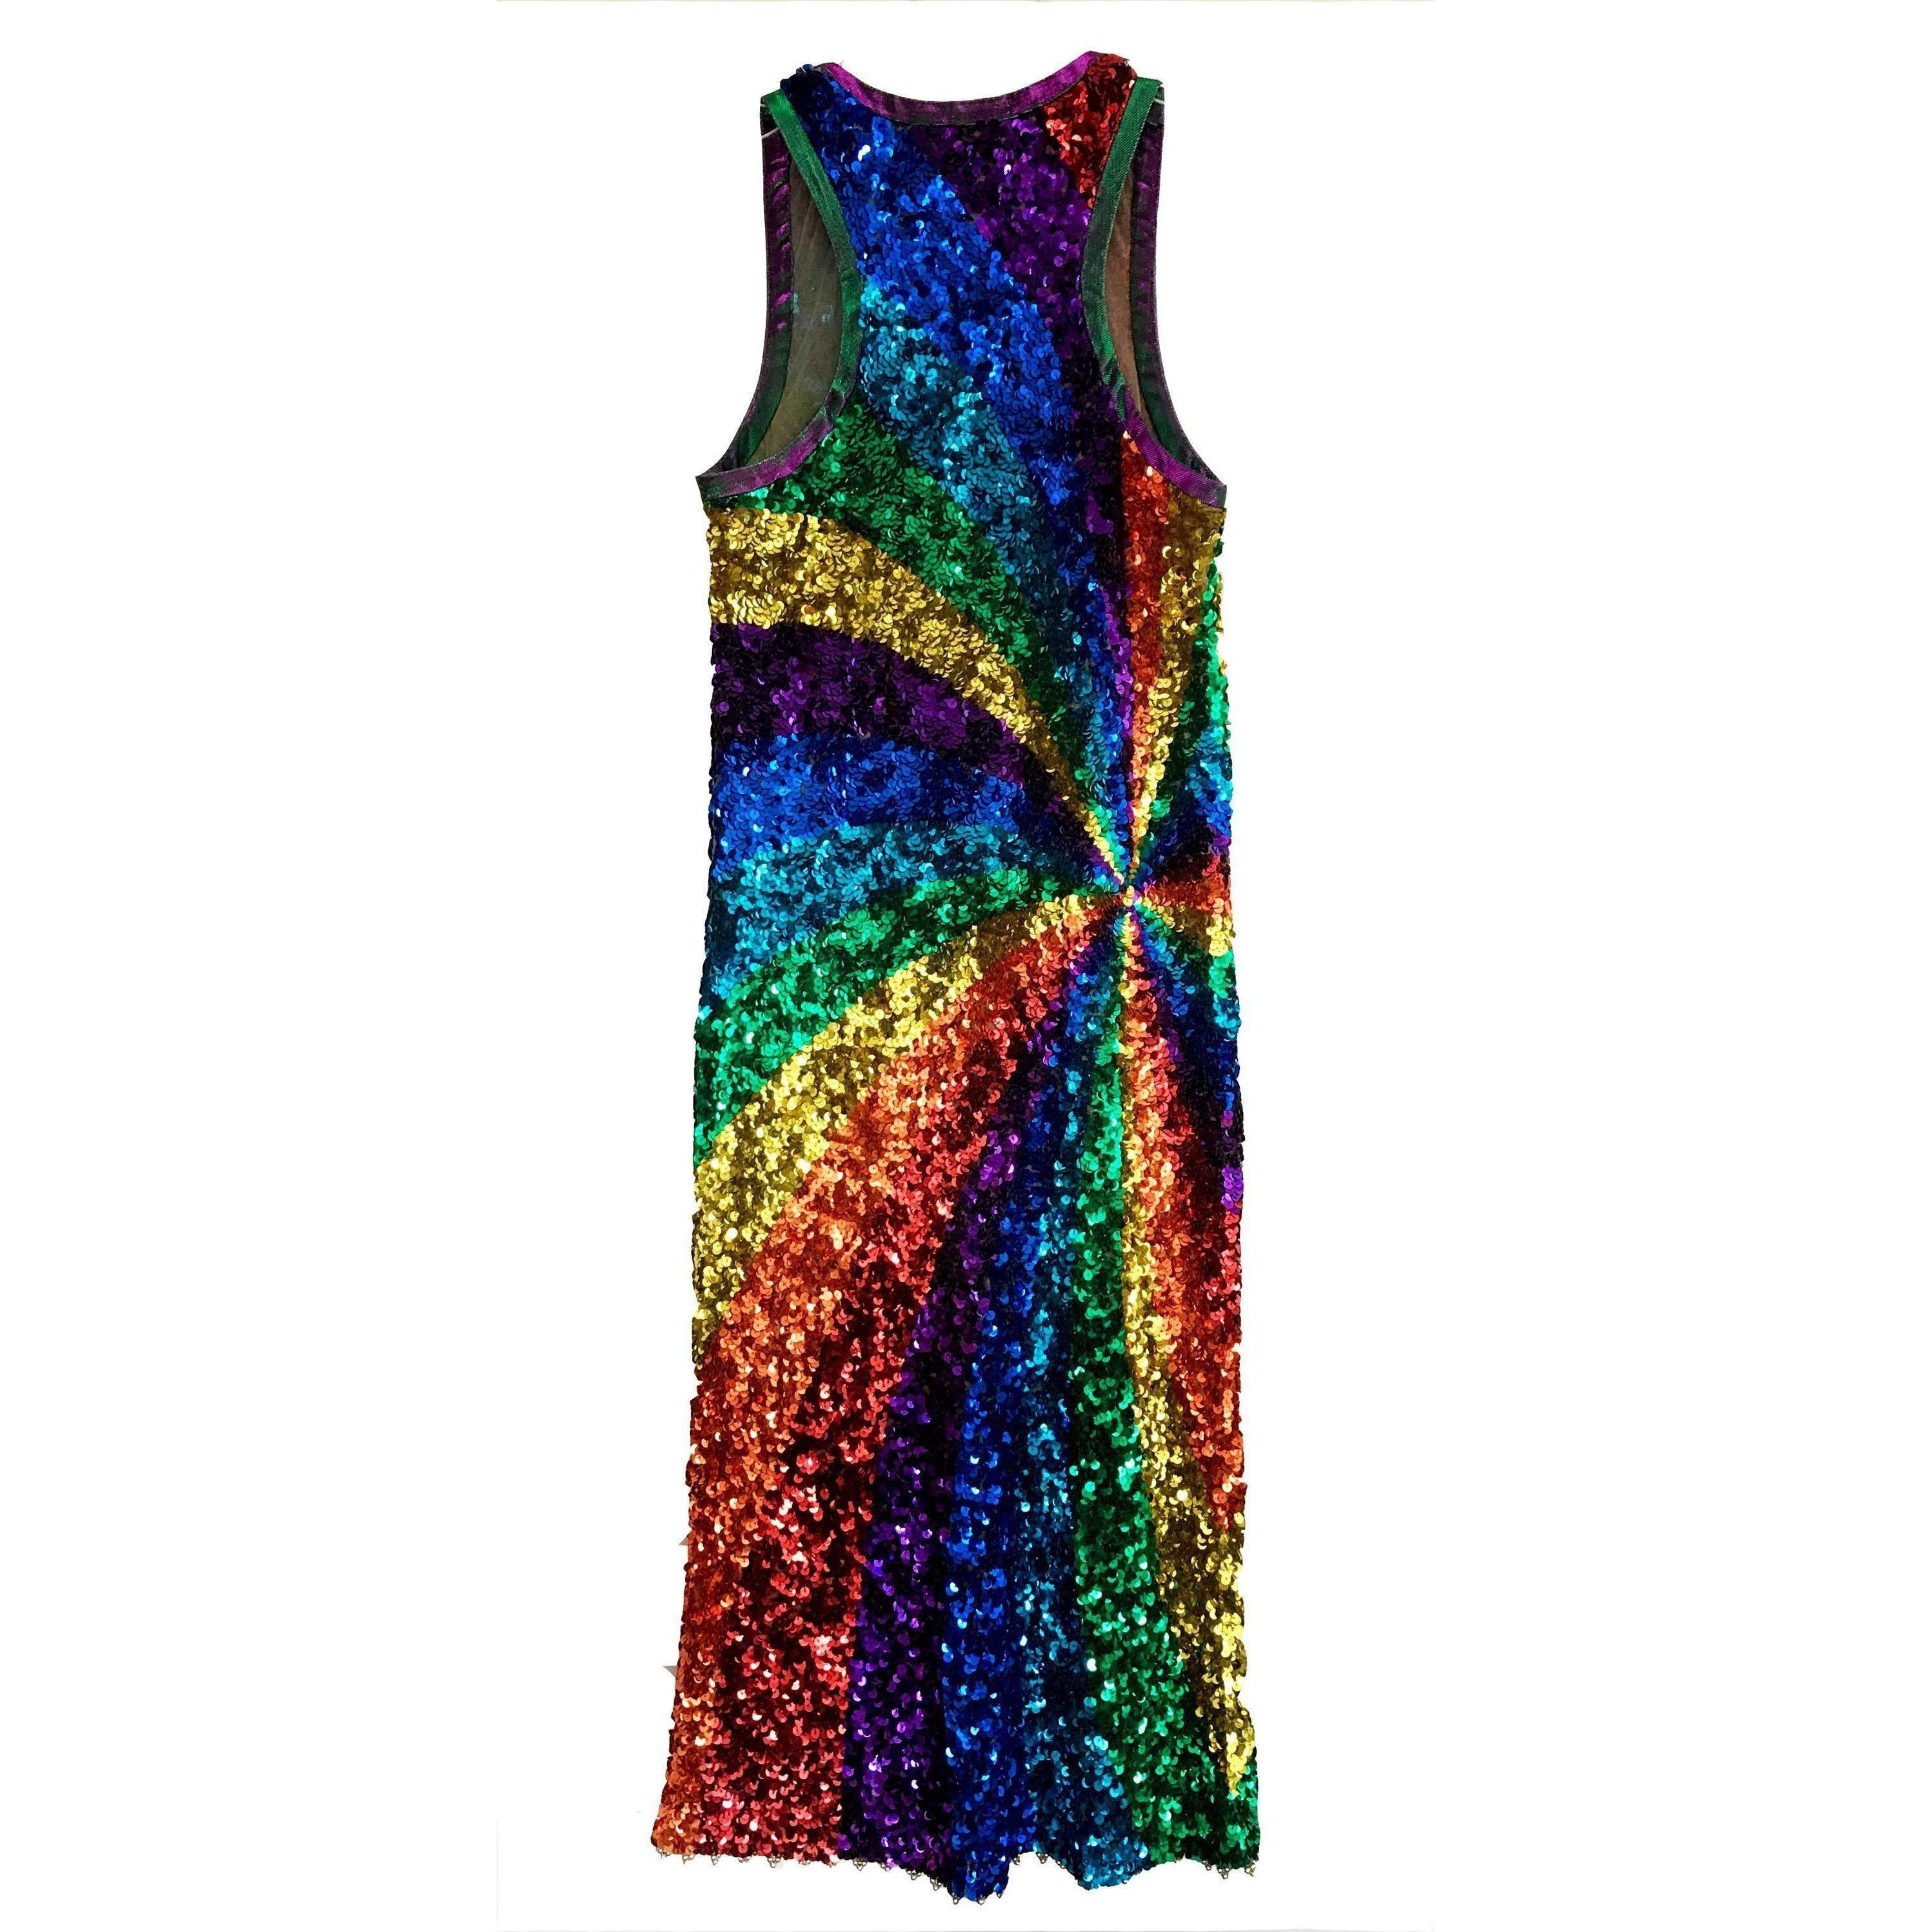 Vestido Arora De Lentejuelas Manish Rainbow Runway Lyst VUqzMpGLS